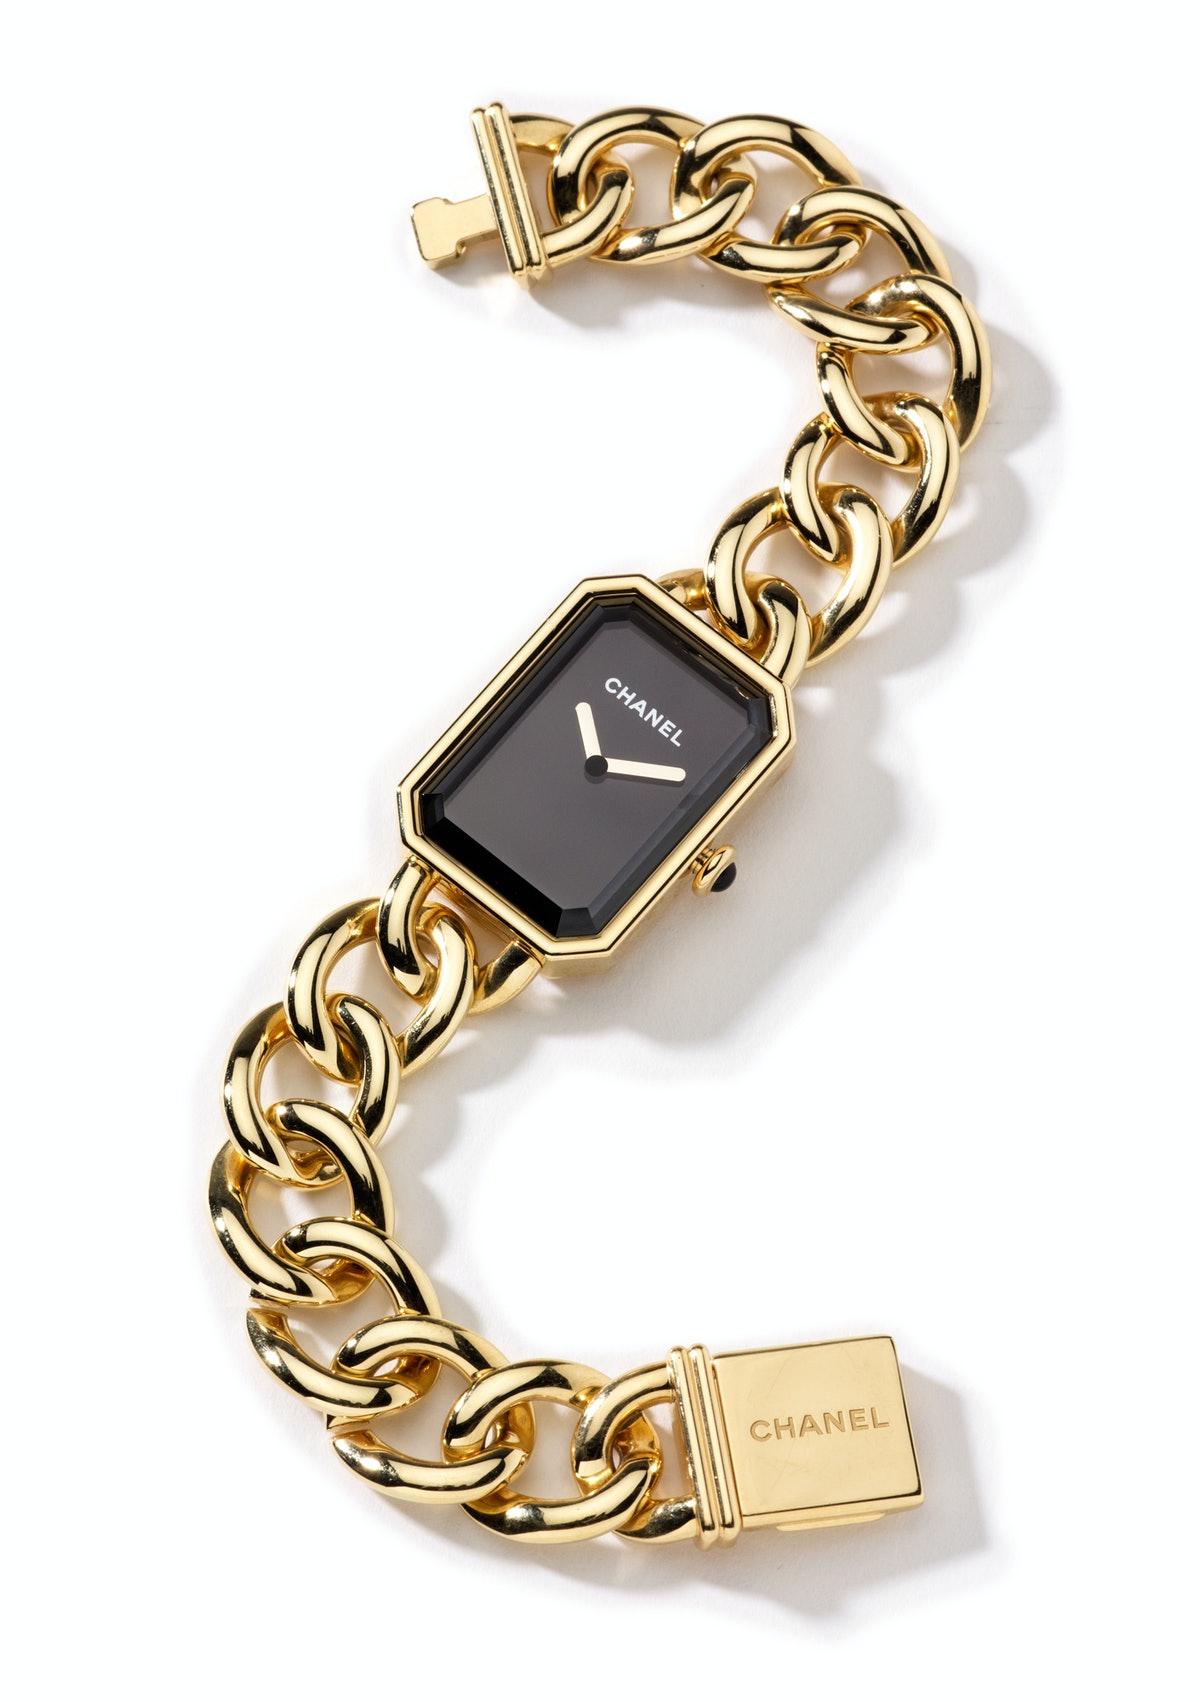 Chanel Watch gold watch, $24,500, Chanel Fine Jewelry.